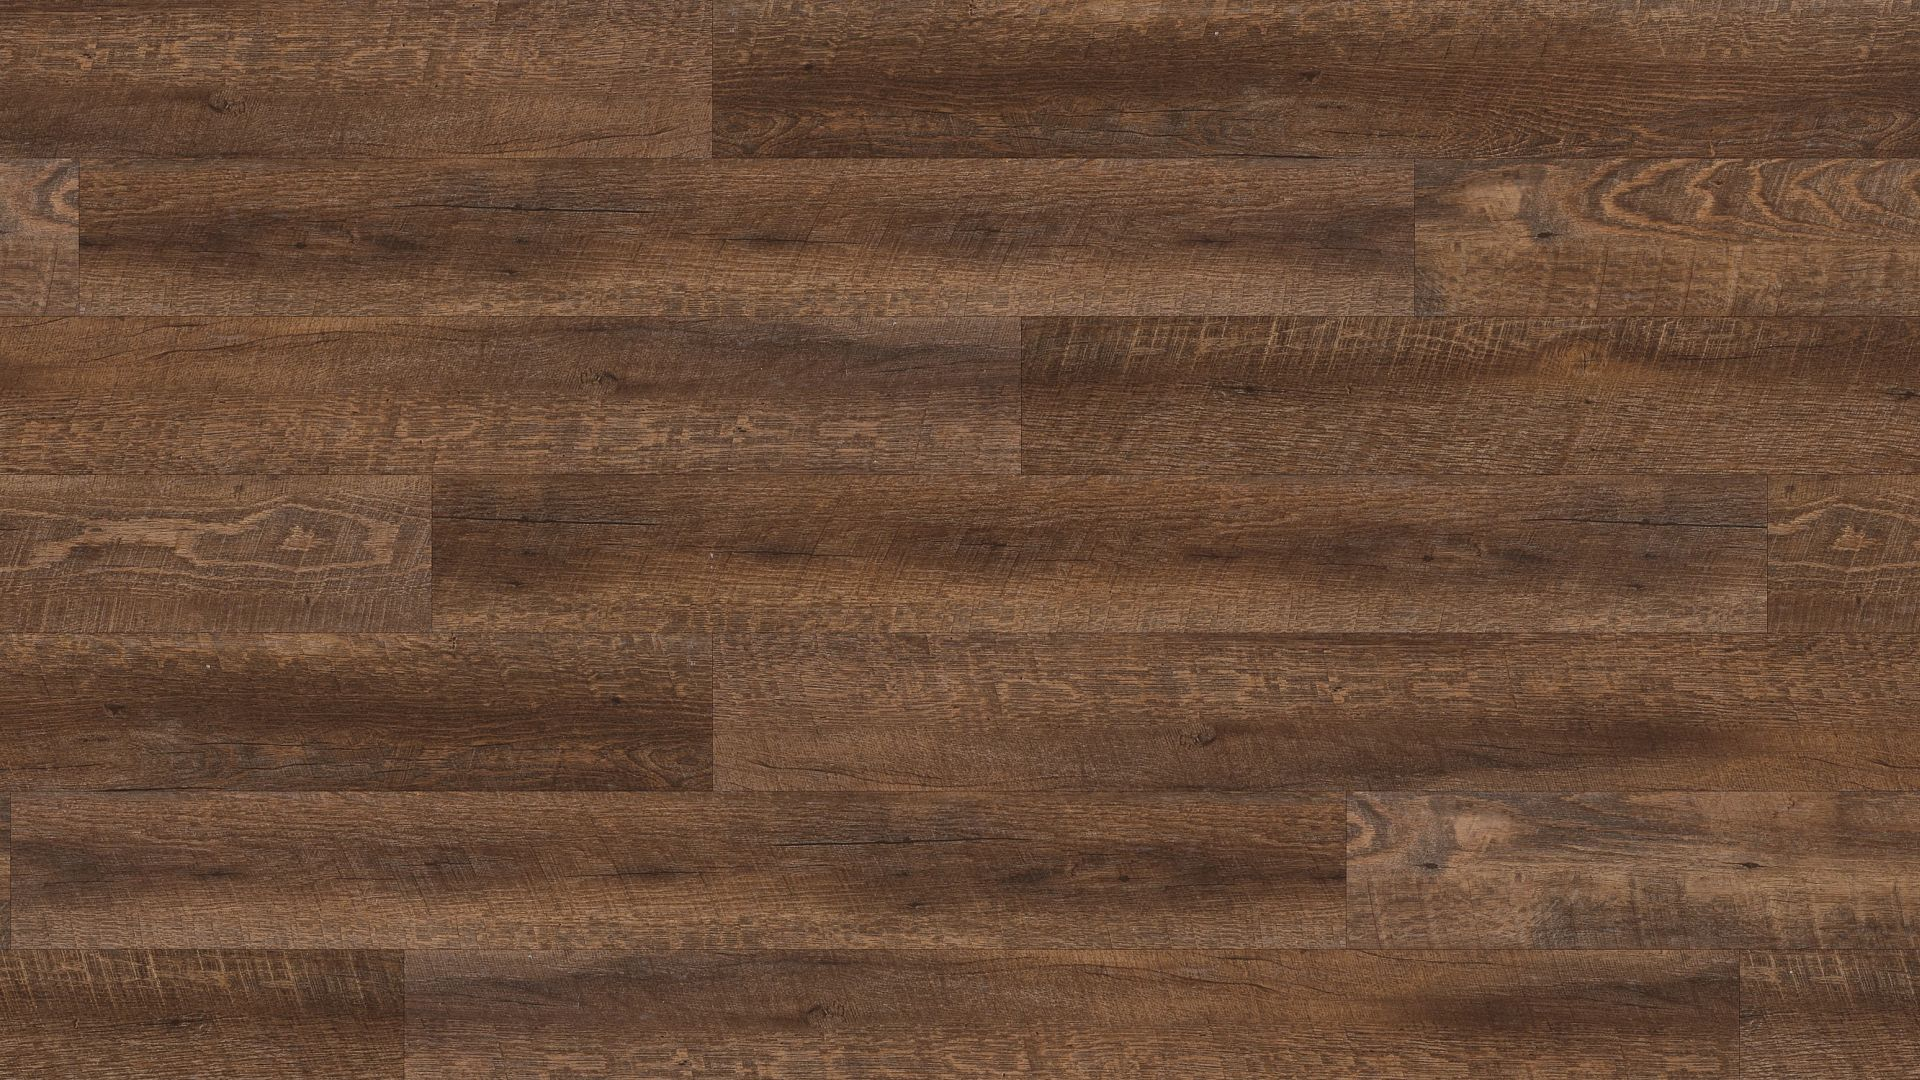 Oak Vv022 00810 Vinyl Plank Flooring